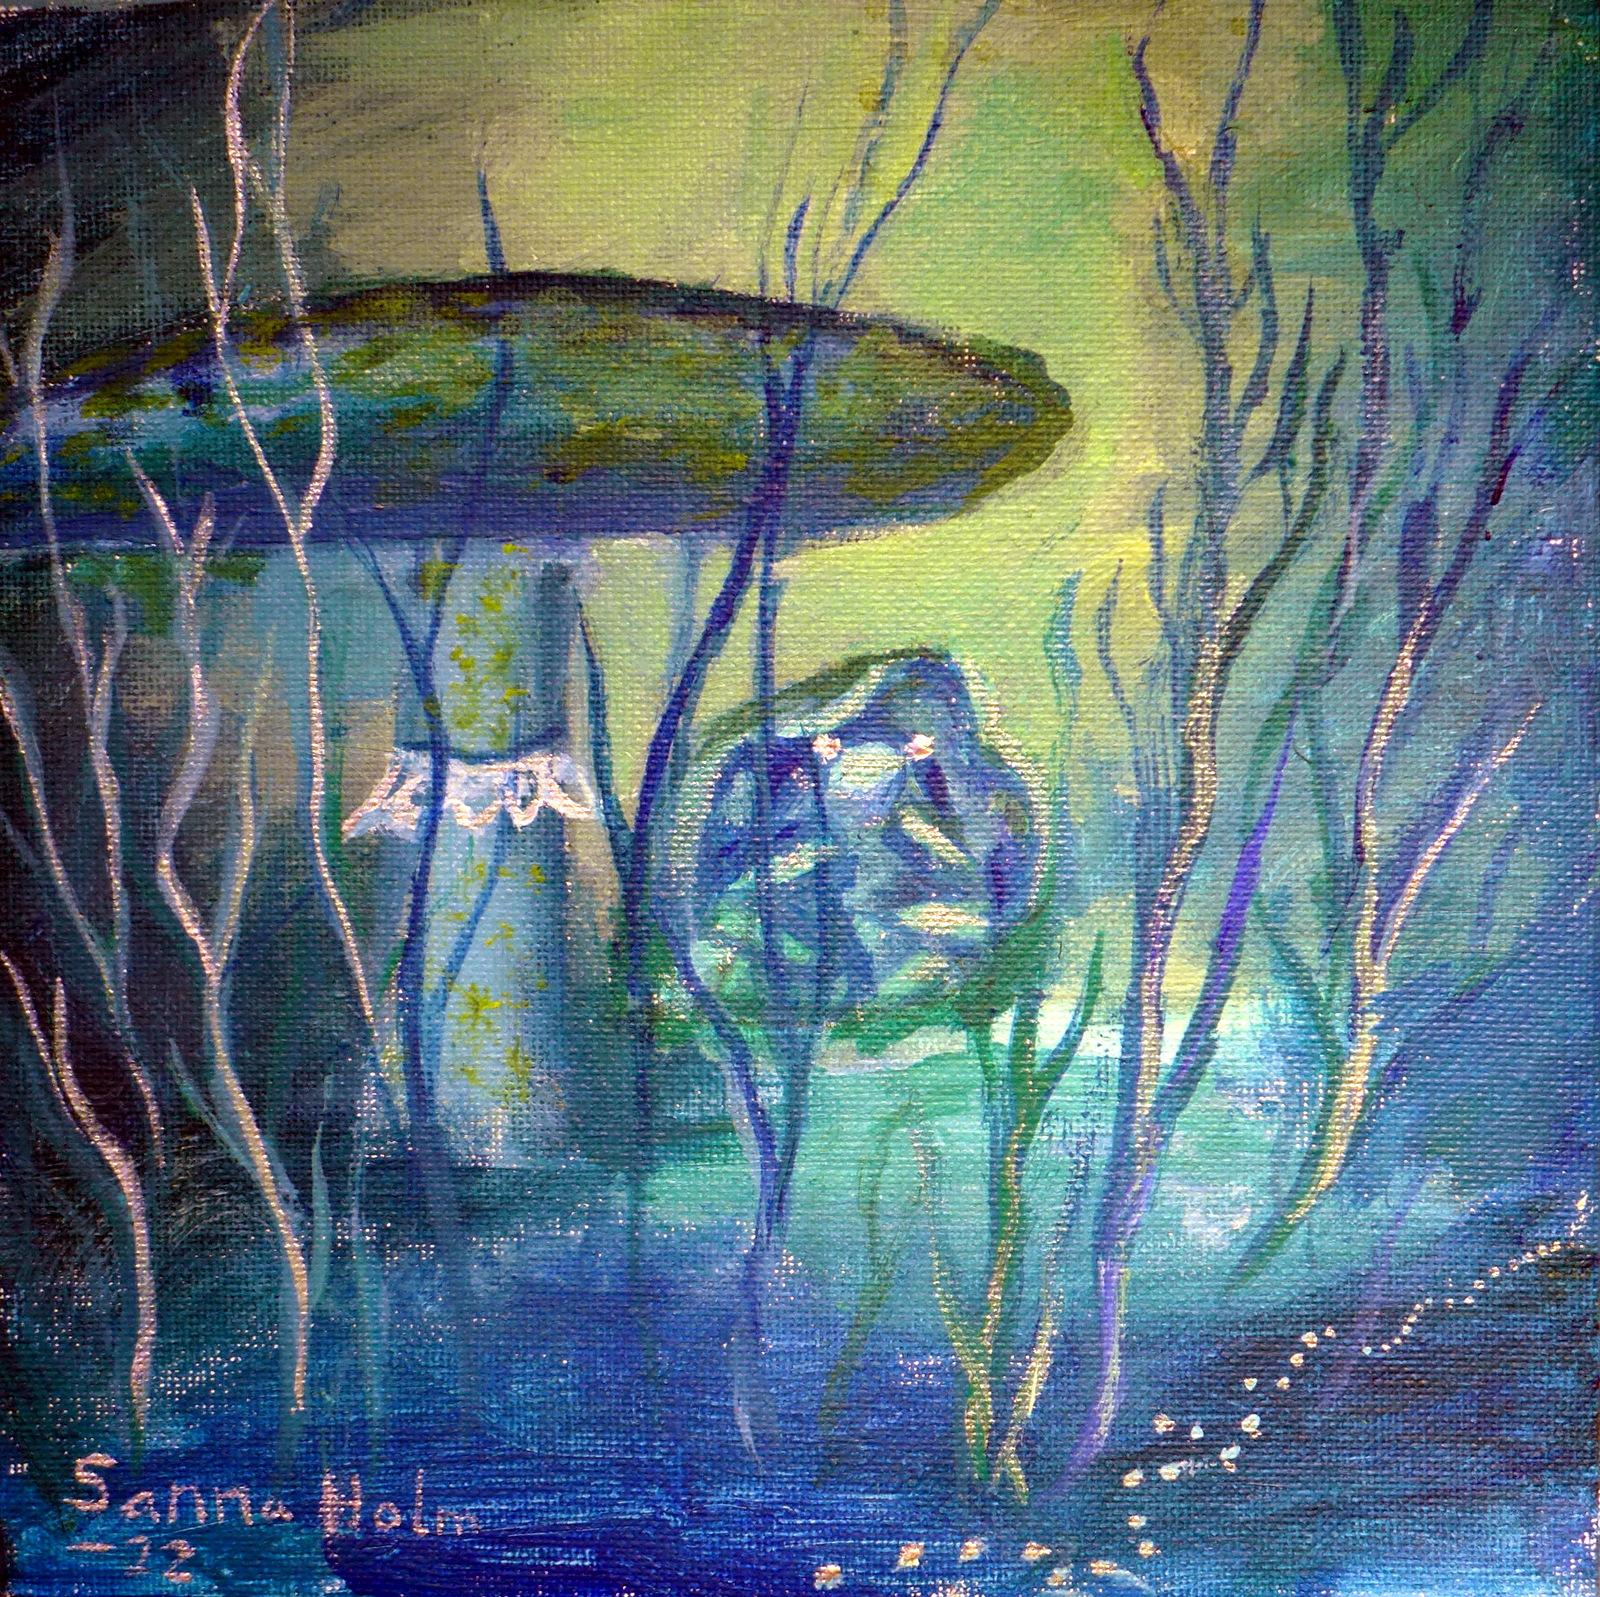 blue mystic - ©sanna holm 2014